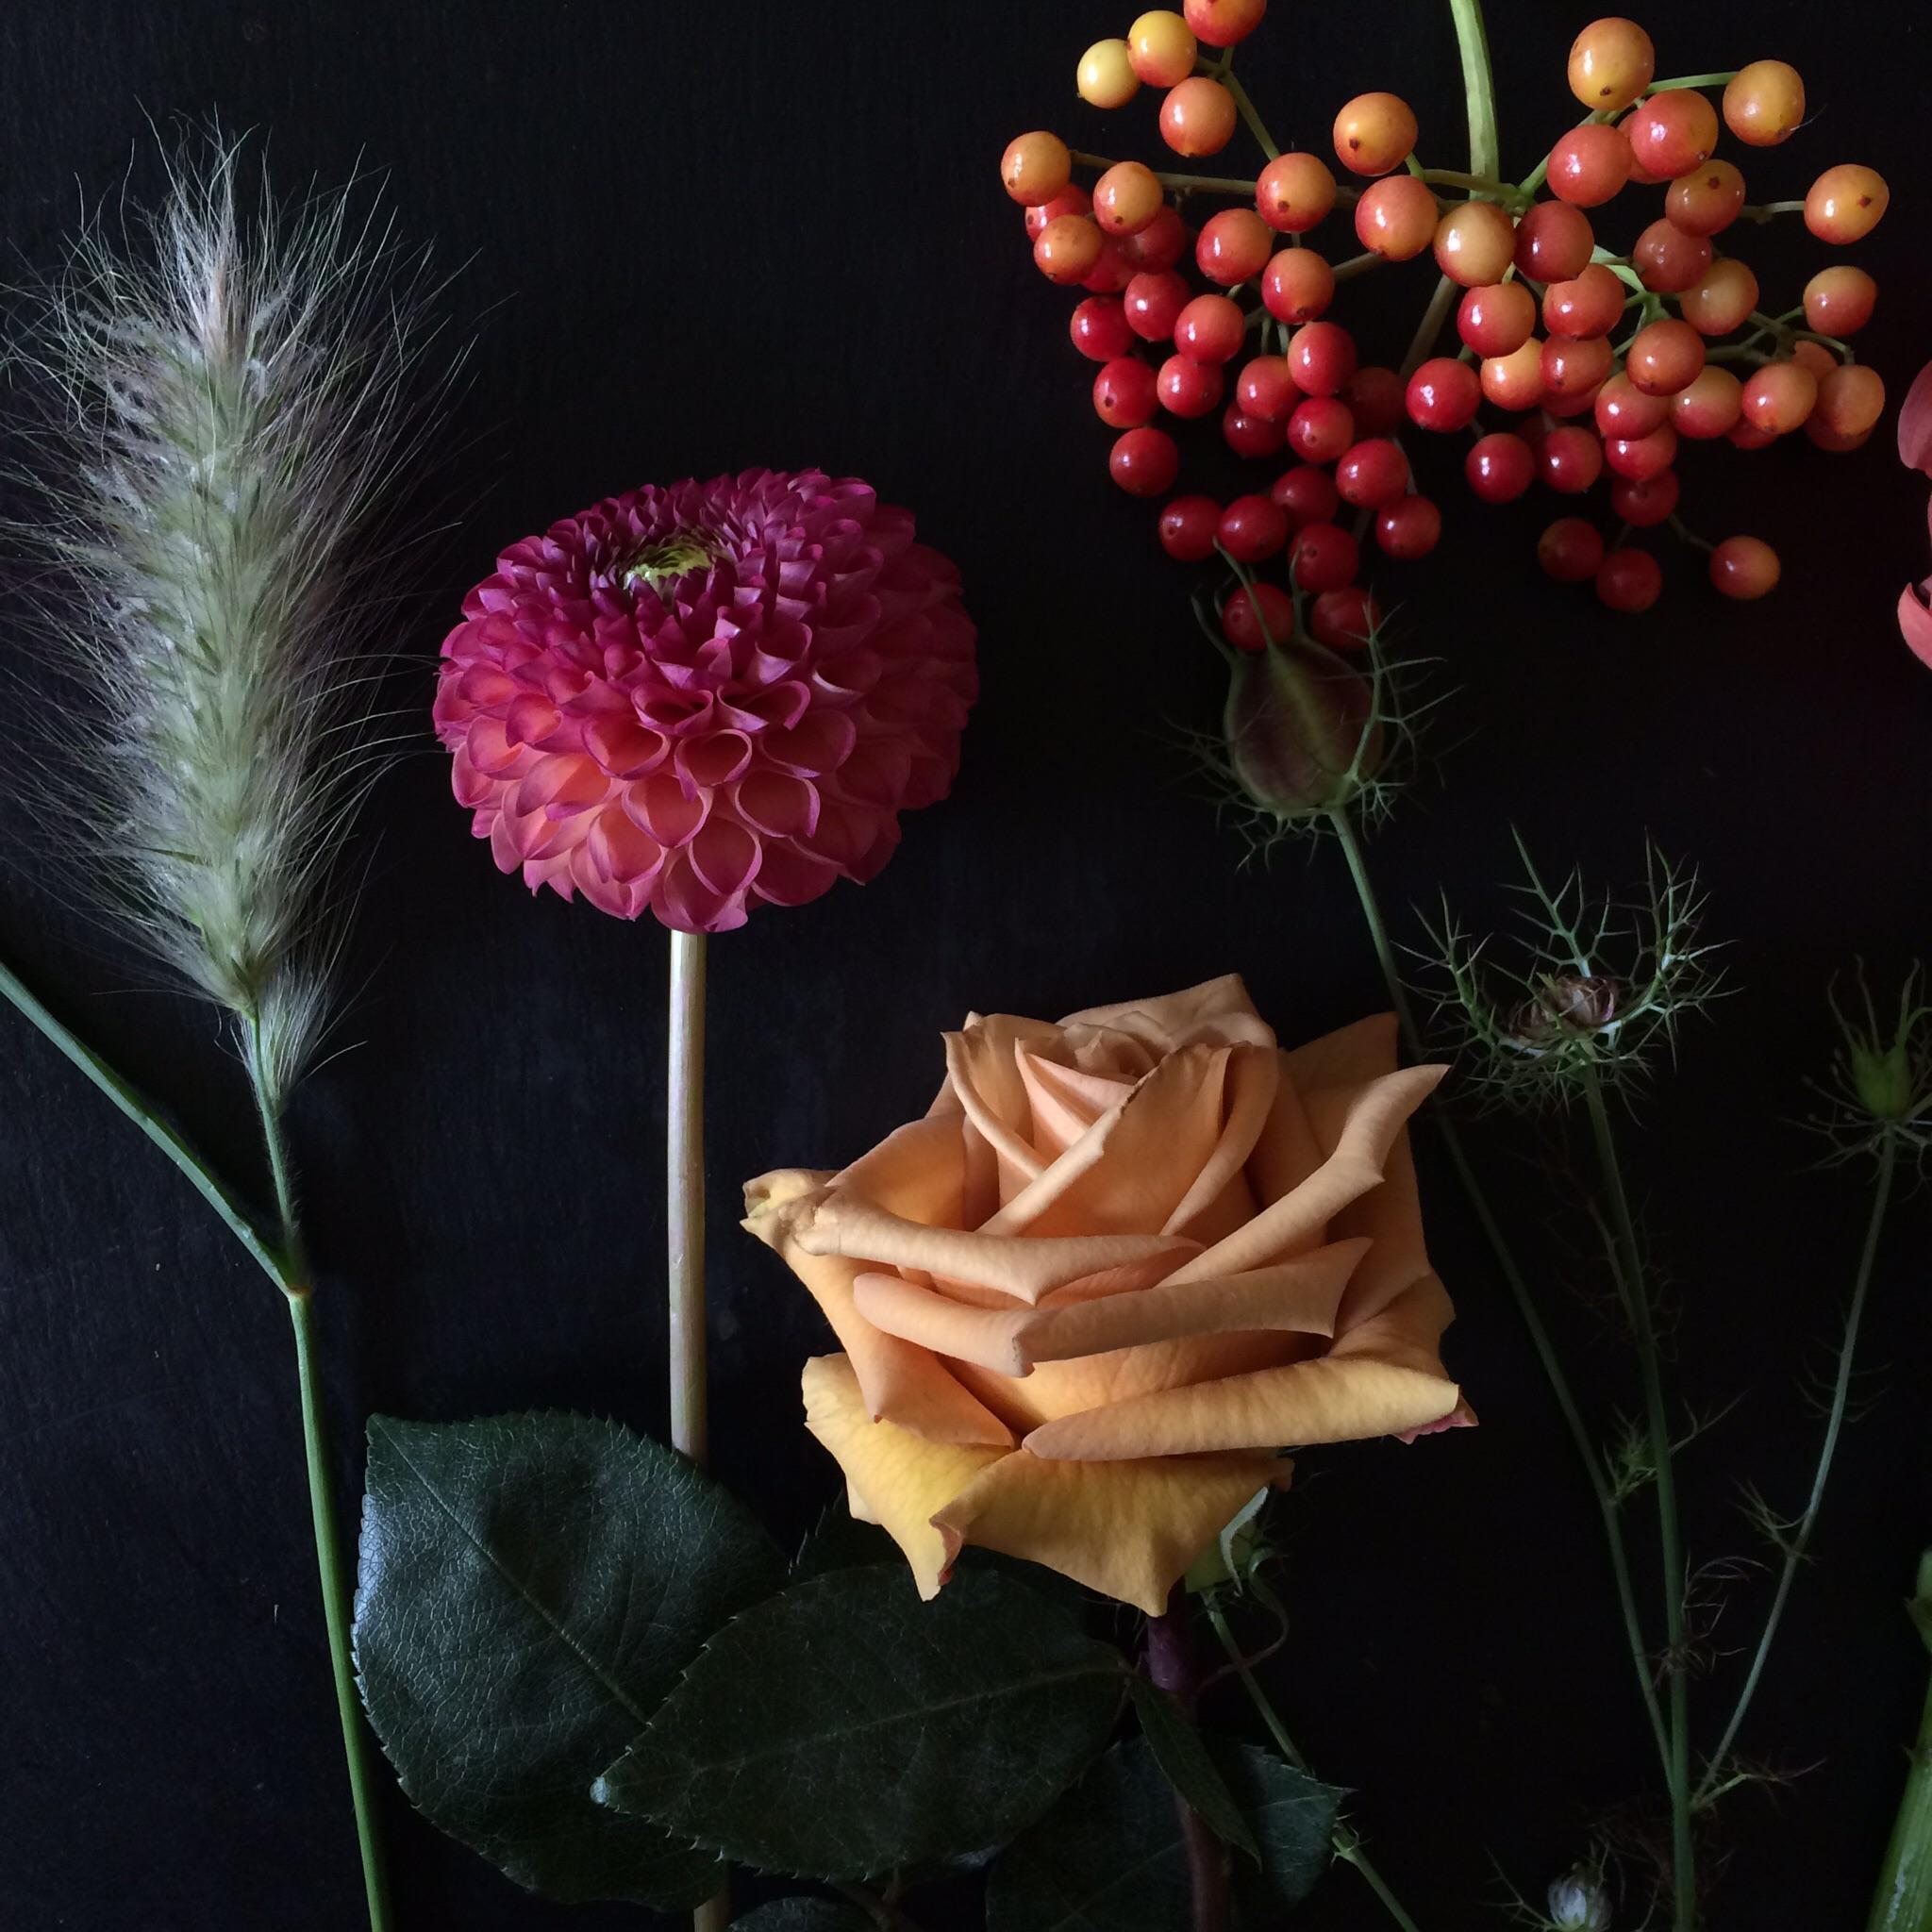 Autumn flowers of viburnum berries, mustard coloured roses, grasses, nigella seed pods and dahlias